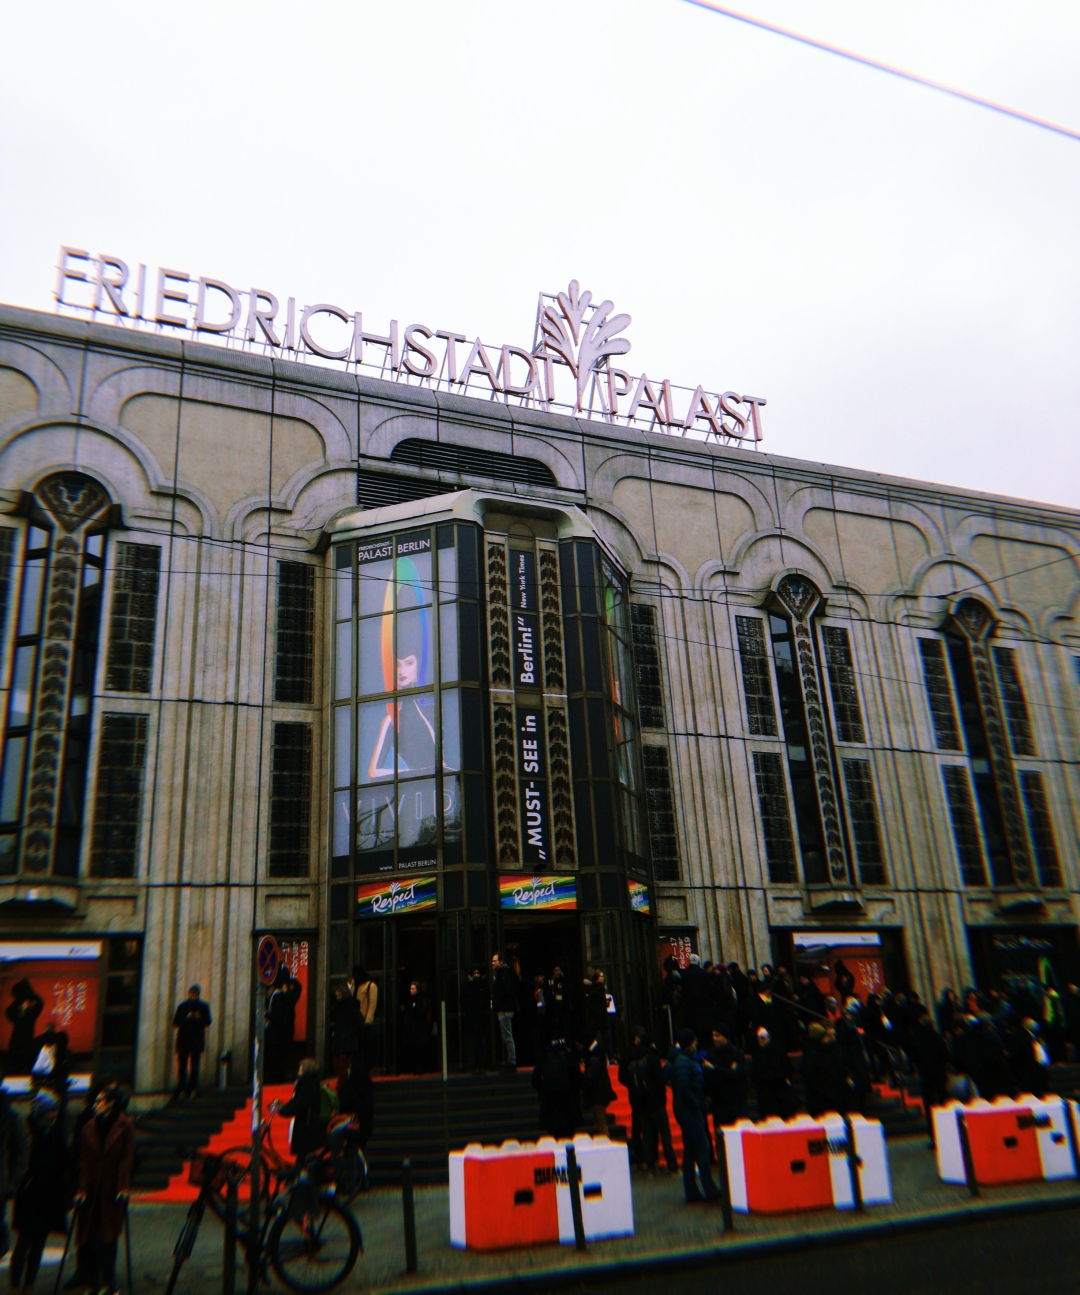 Berlinale 2019 movie theatres